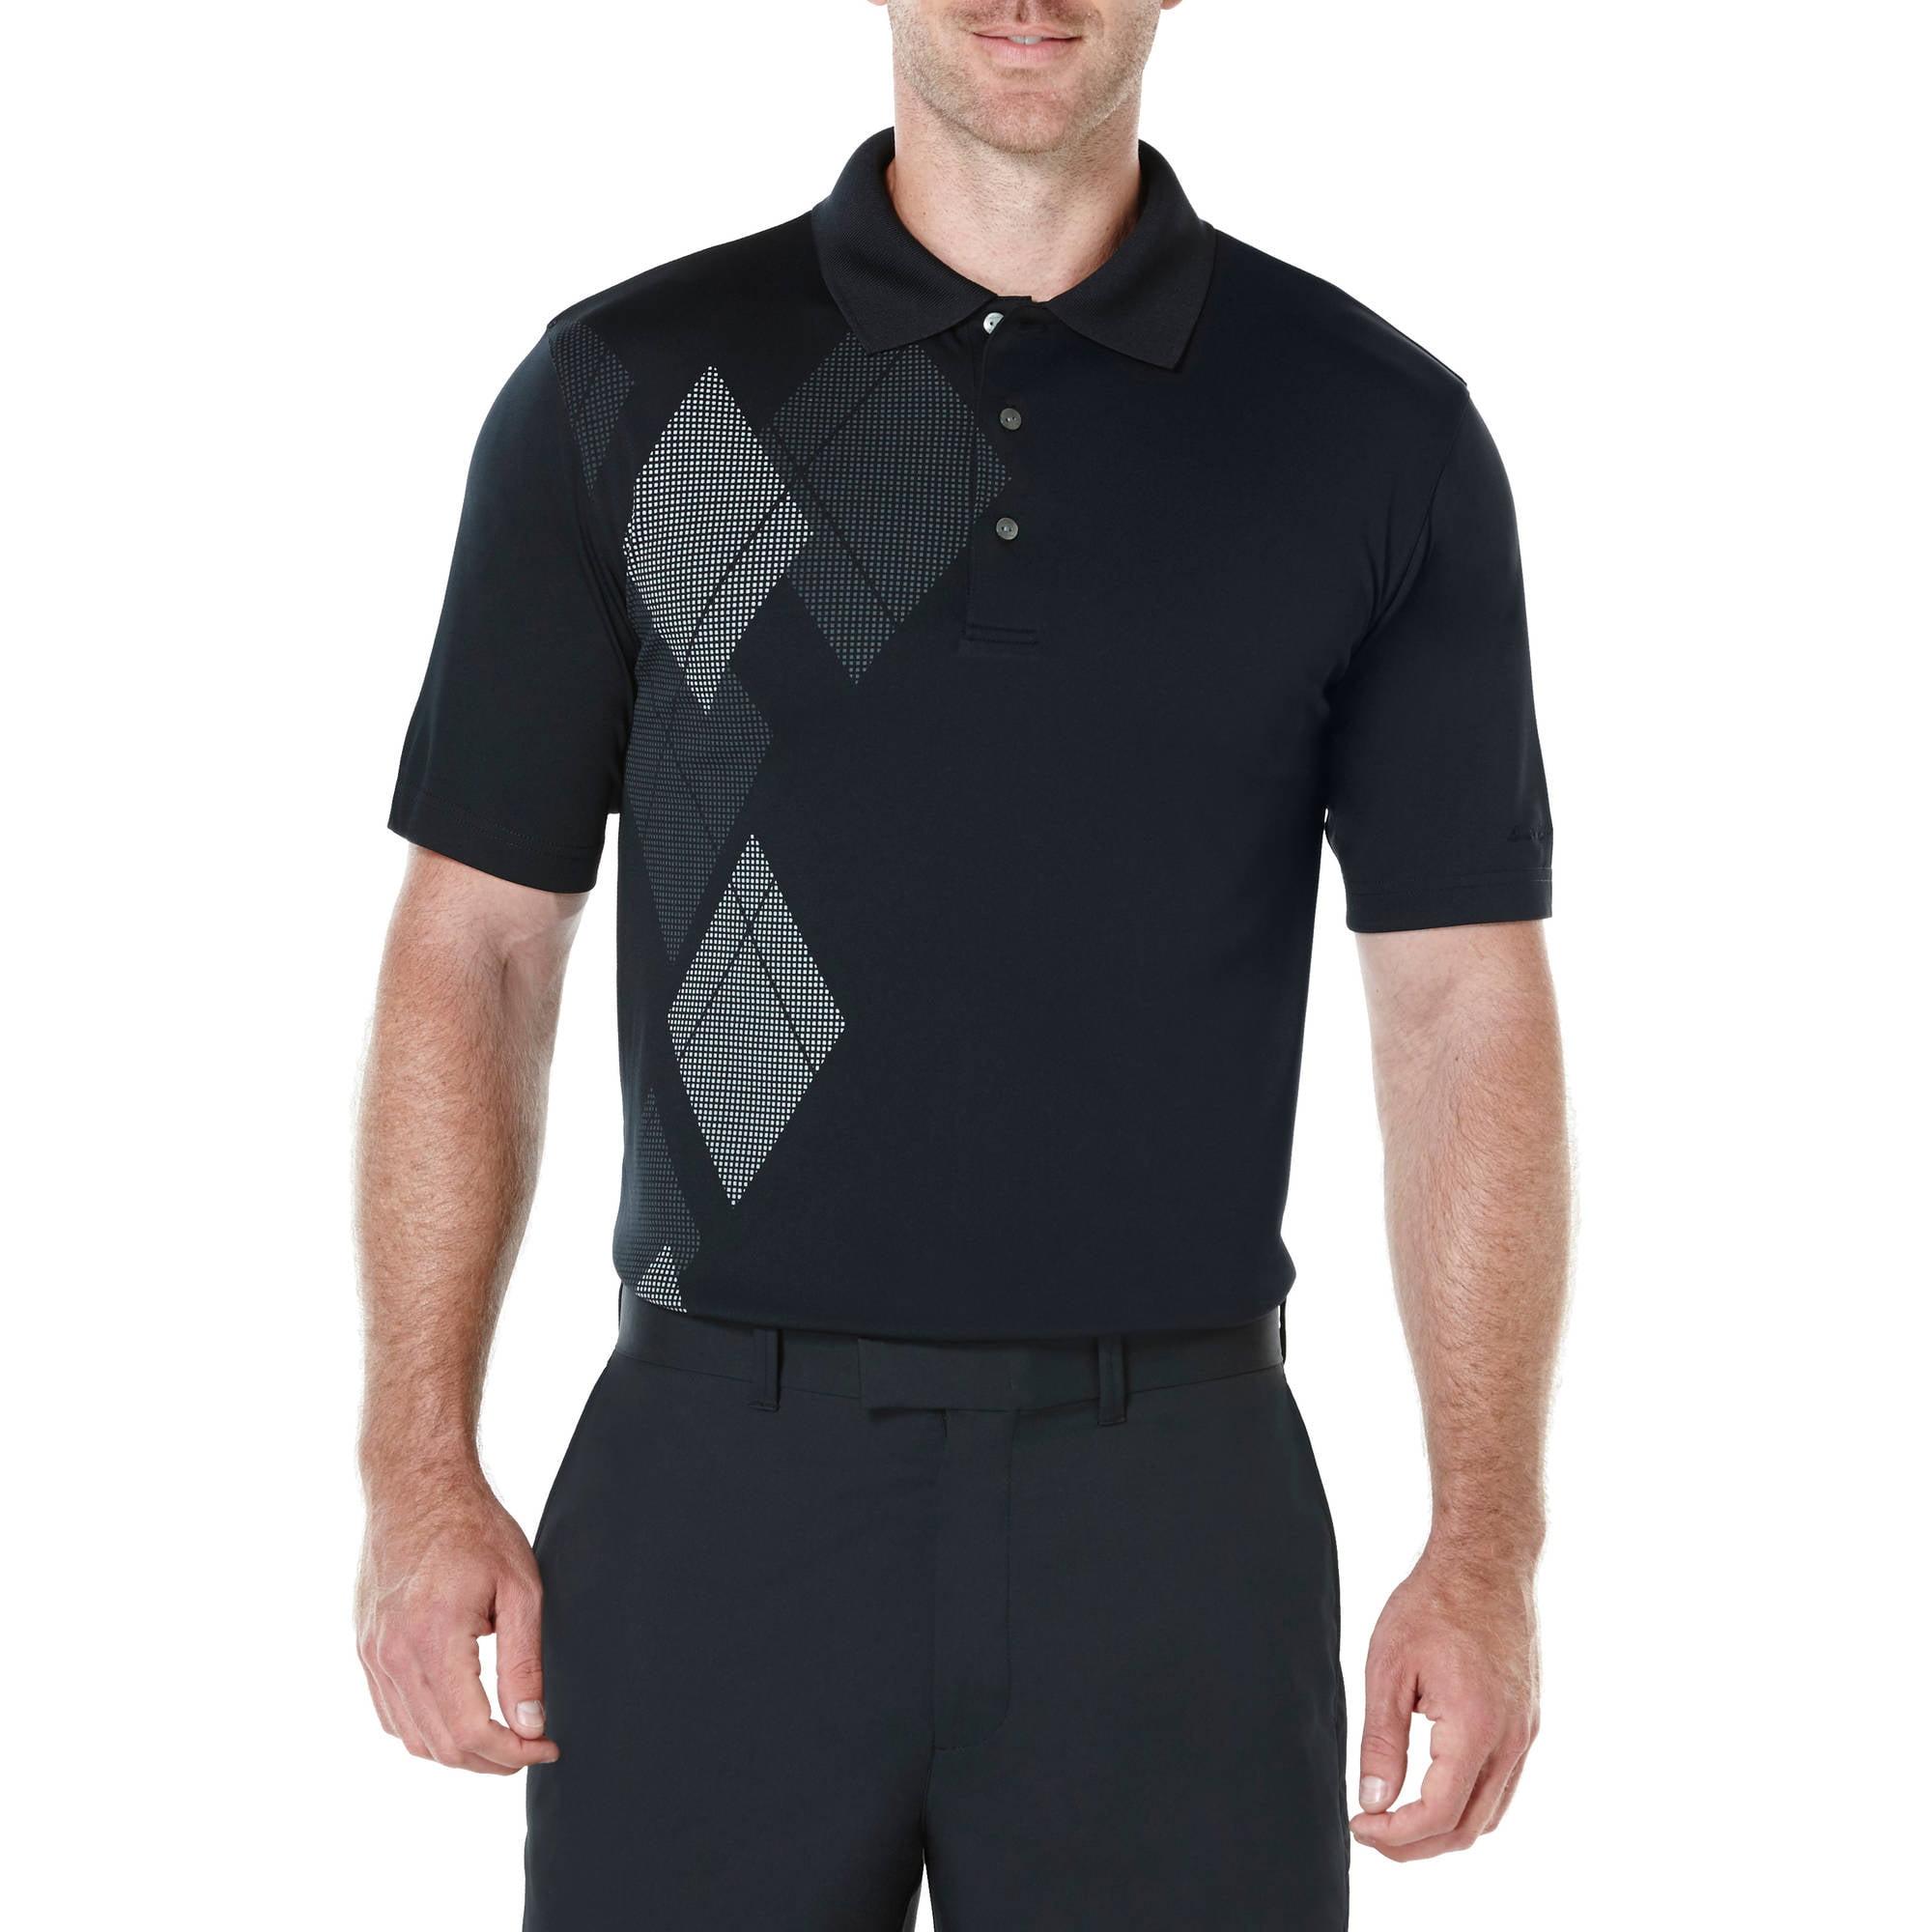 Ben Hogan Performance Big Men's Argyle Print Golf Polo Shirt